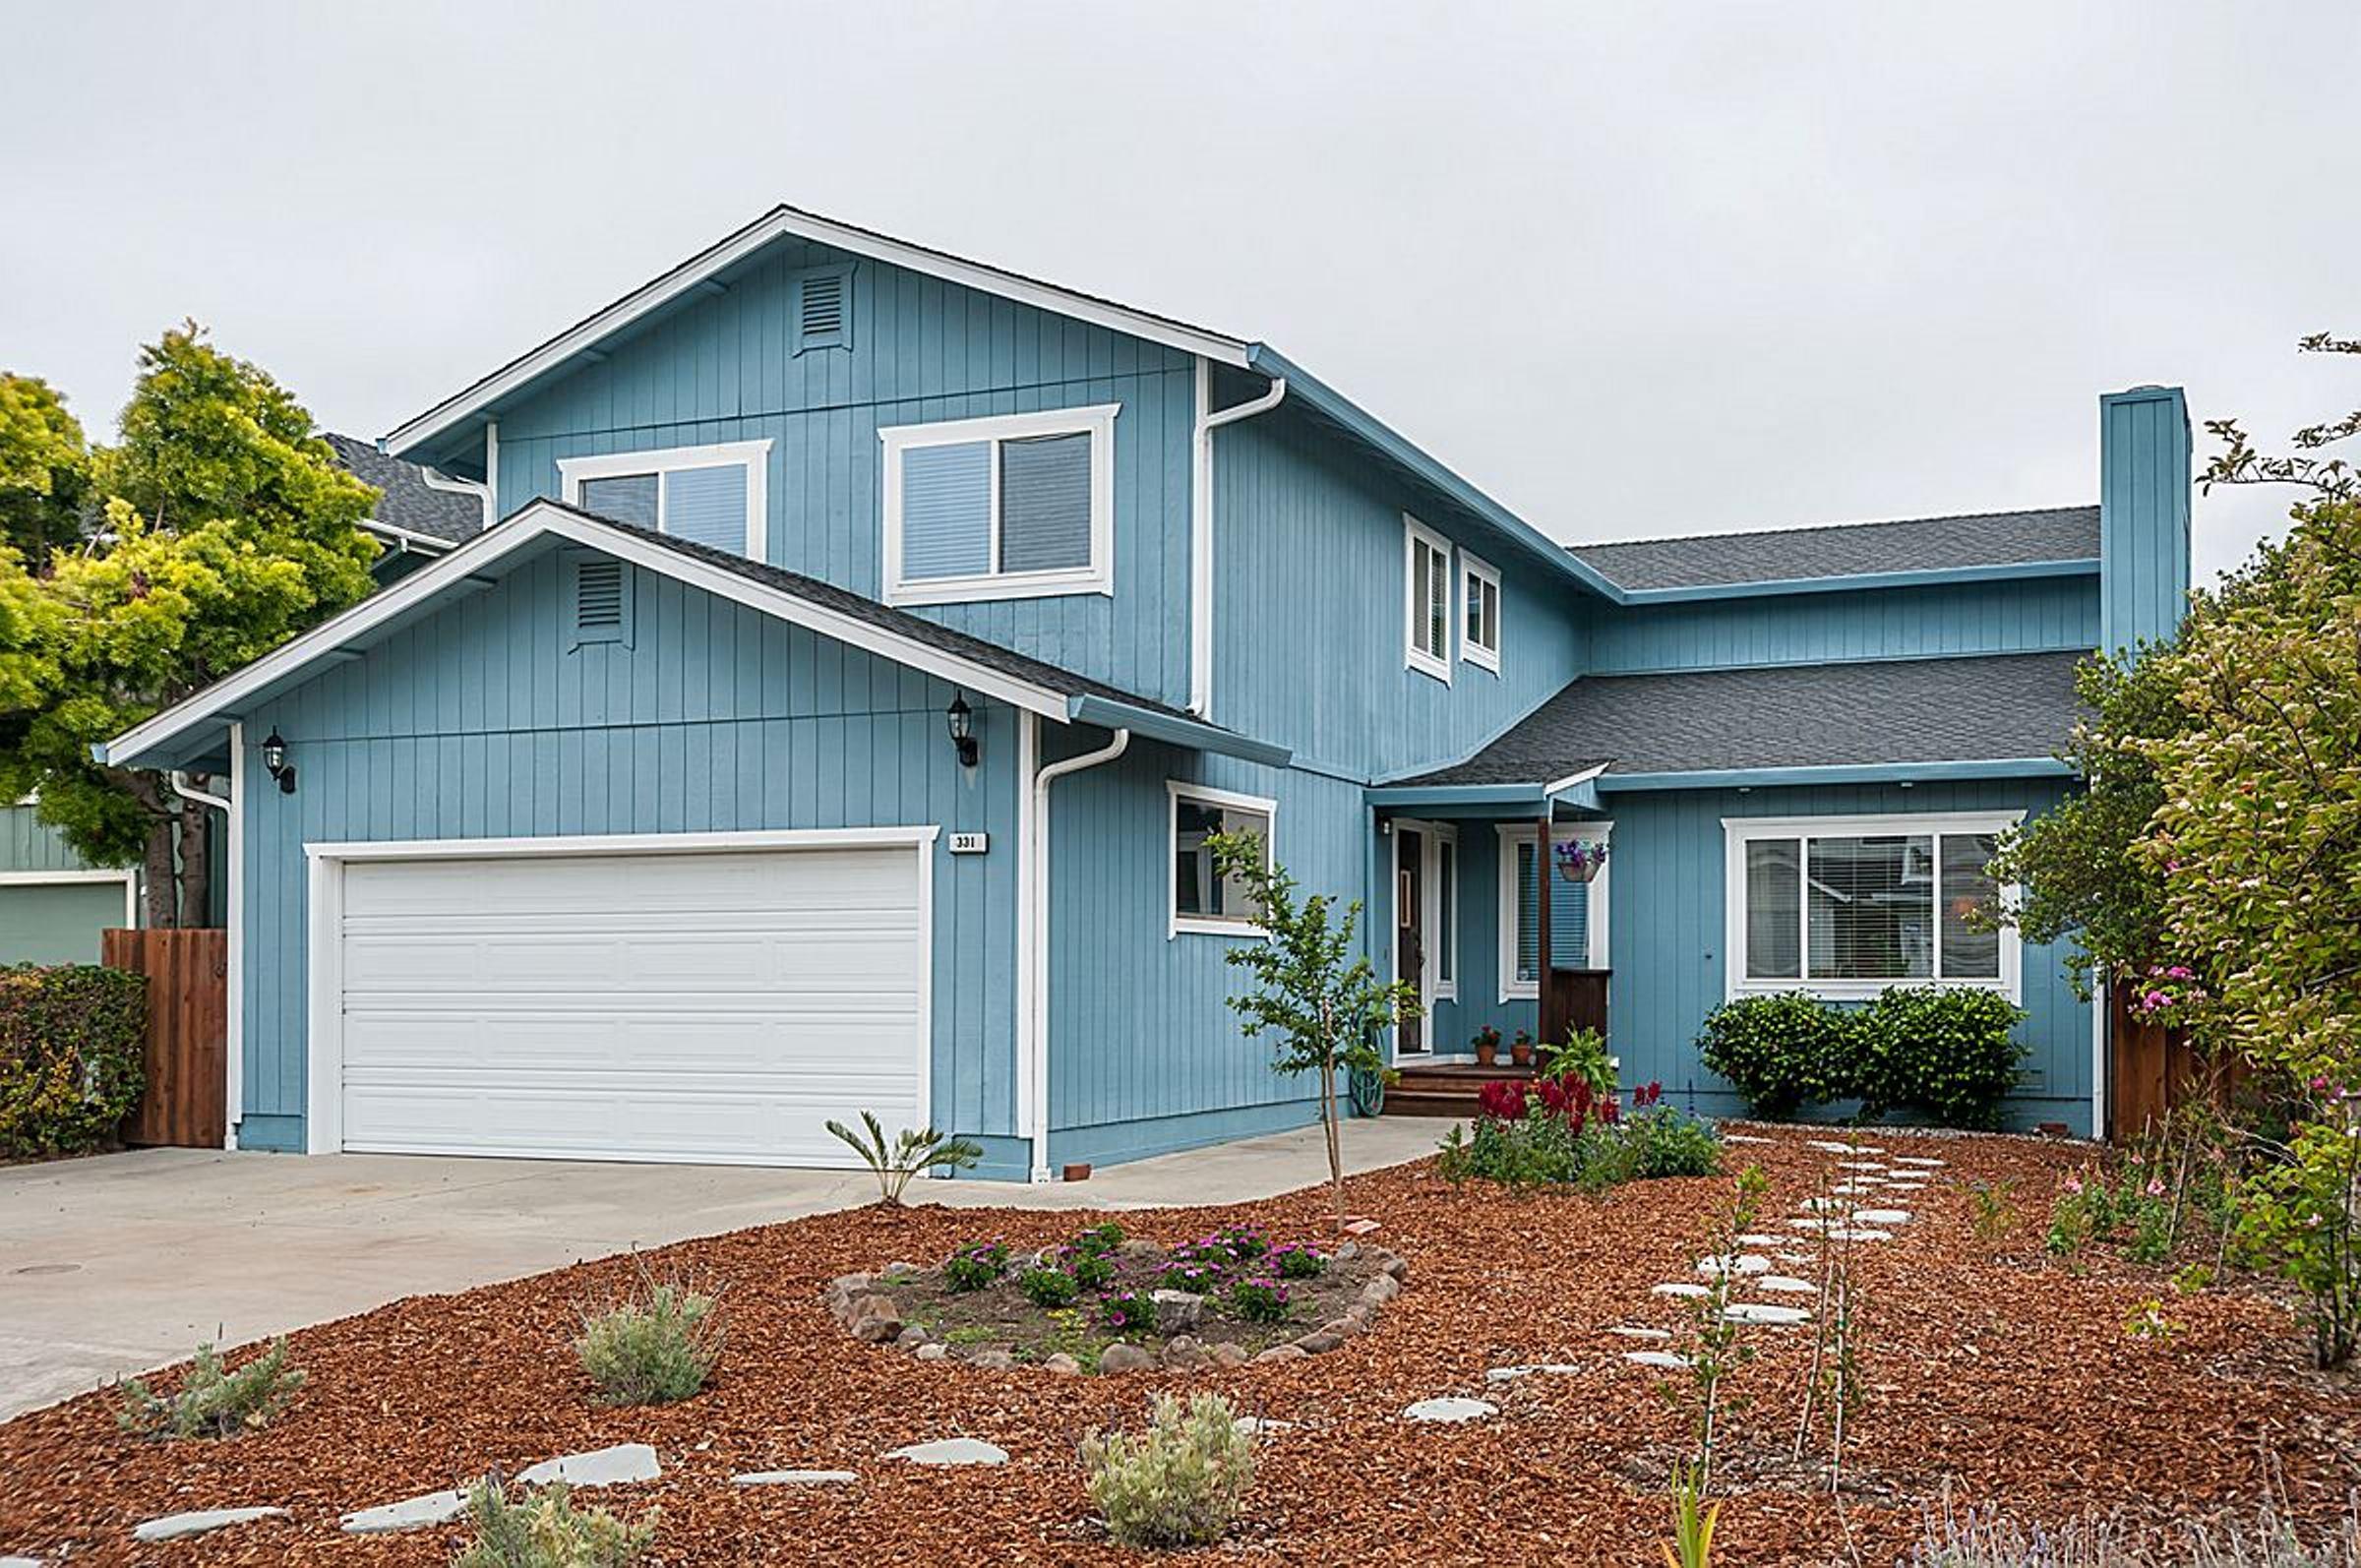 331 Miramontes Ave, Half Moon Bay, CA 94019